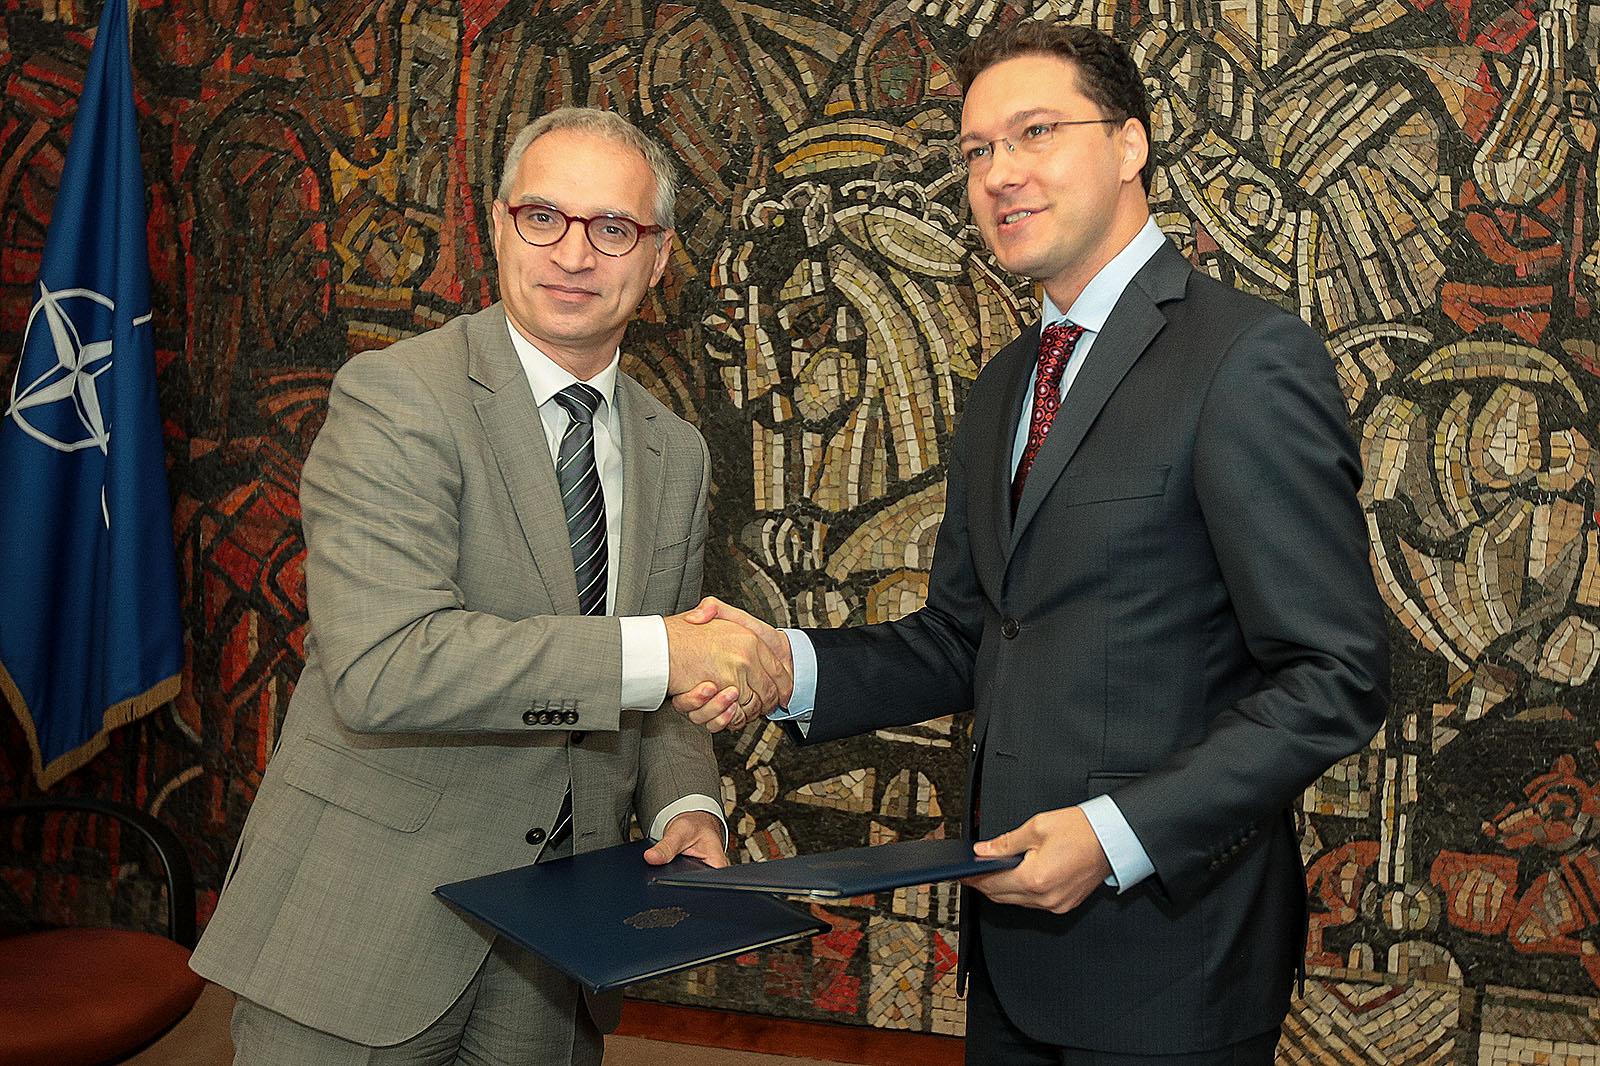 RCC Secretary General, Goran Svilanović (left), with Minister of Foreign Affairs of Bulgaria, Daniel Mitov, in Sofia on 14 September 2015. (Photo: MFA Bulgaria/Dimitar Kyosemarliev)